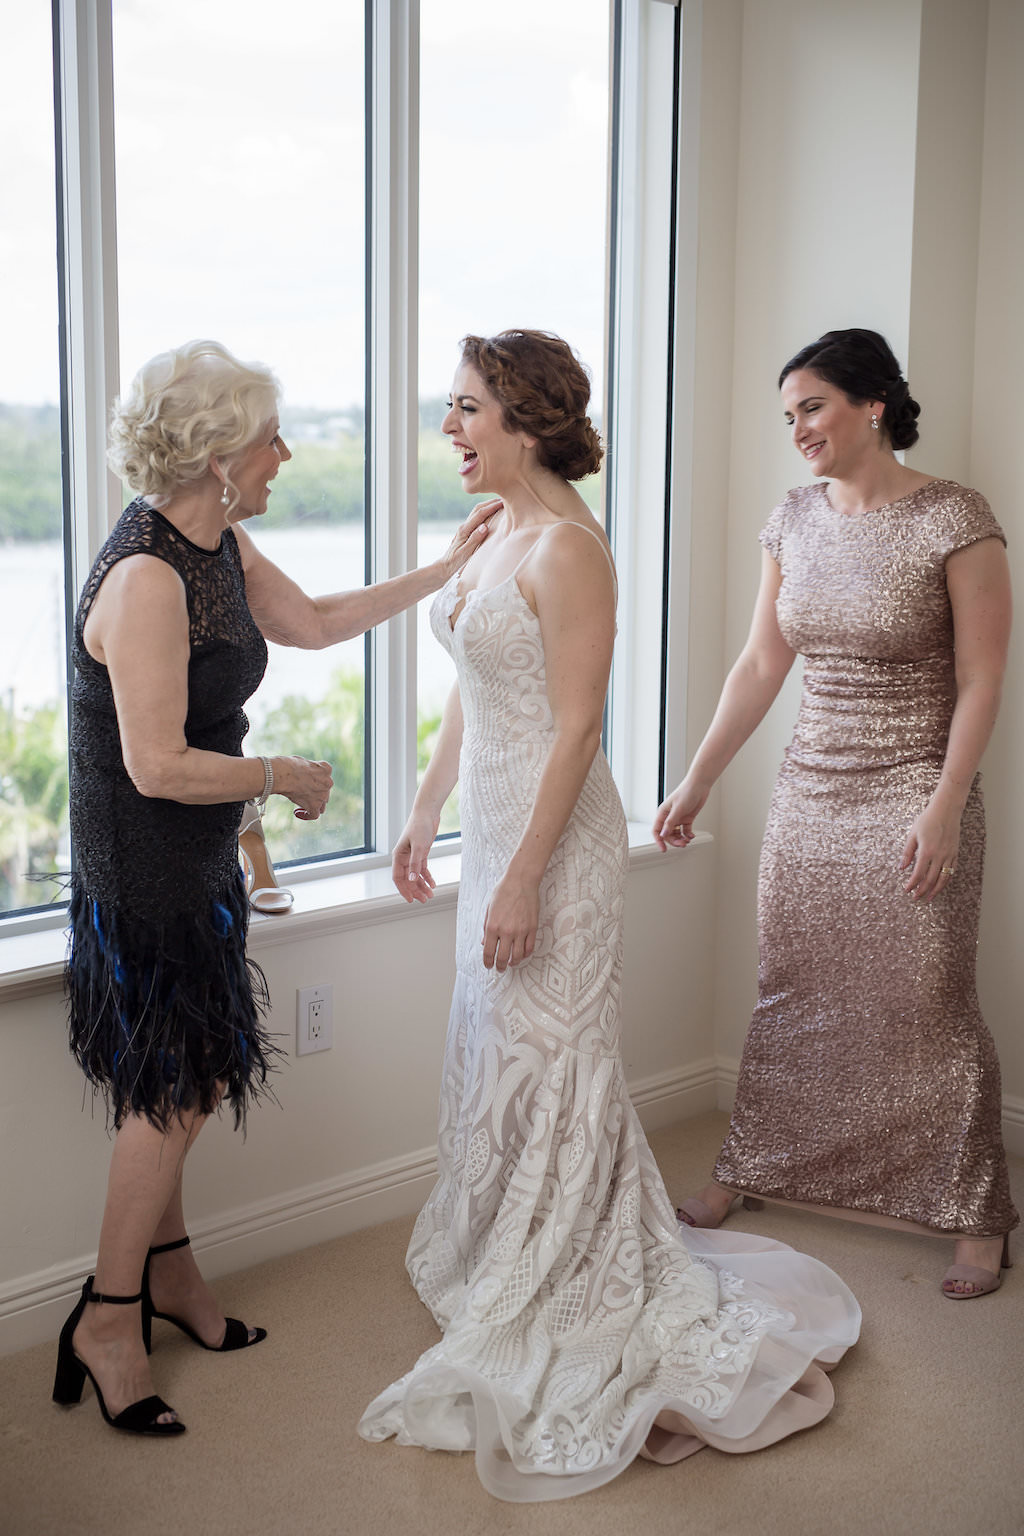 Florida Bride Getting Ready Wedding Portrait | Tampa Bay Photographer Cat Pennenga Photography